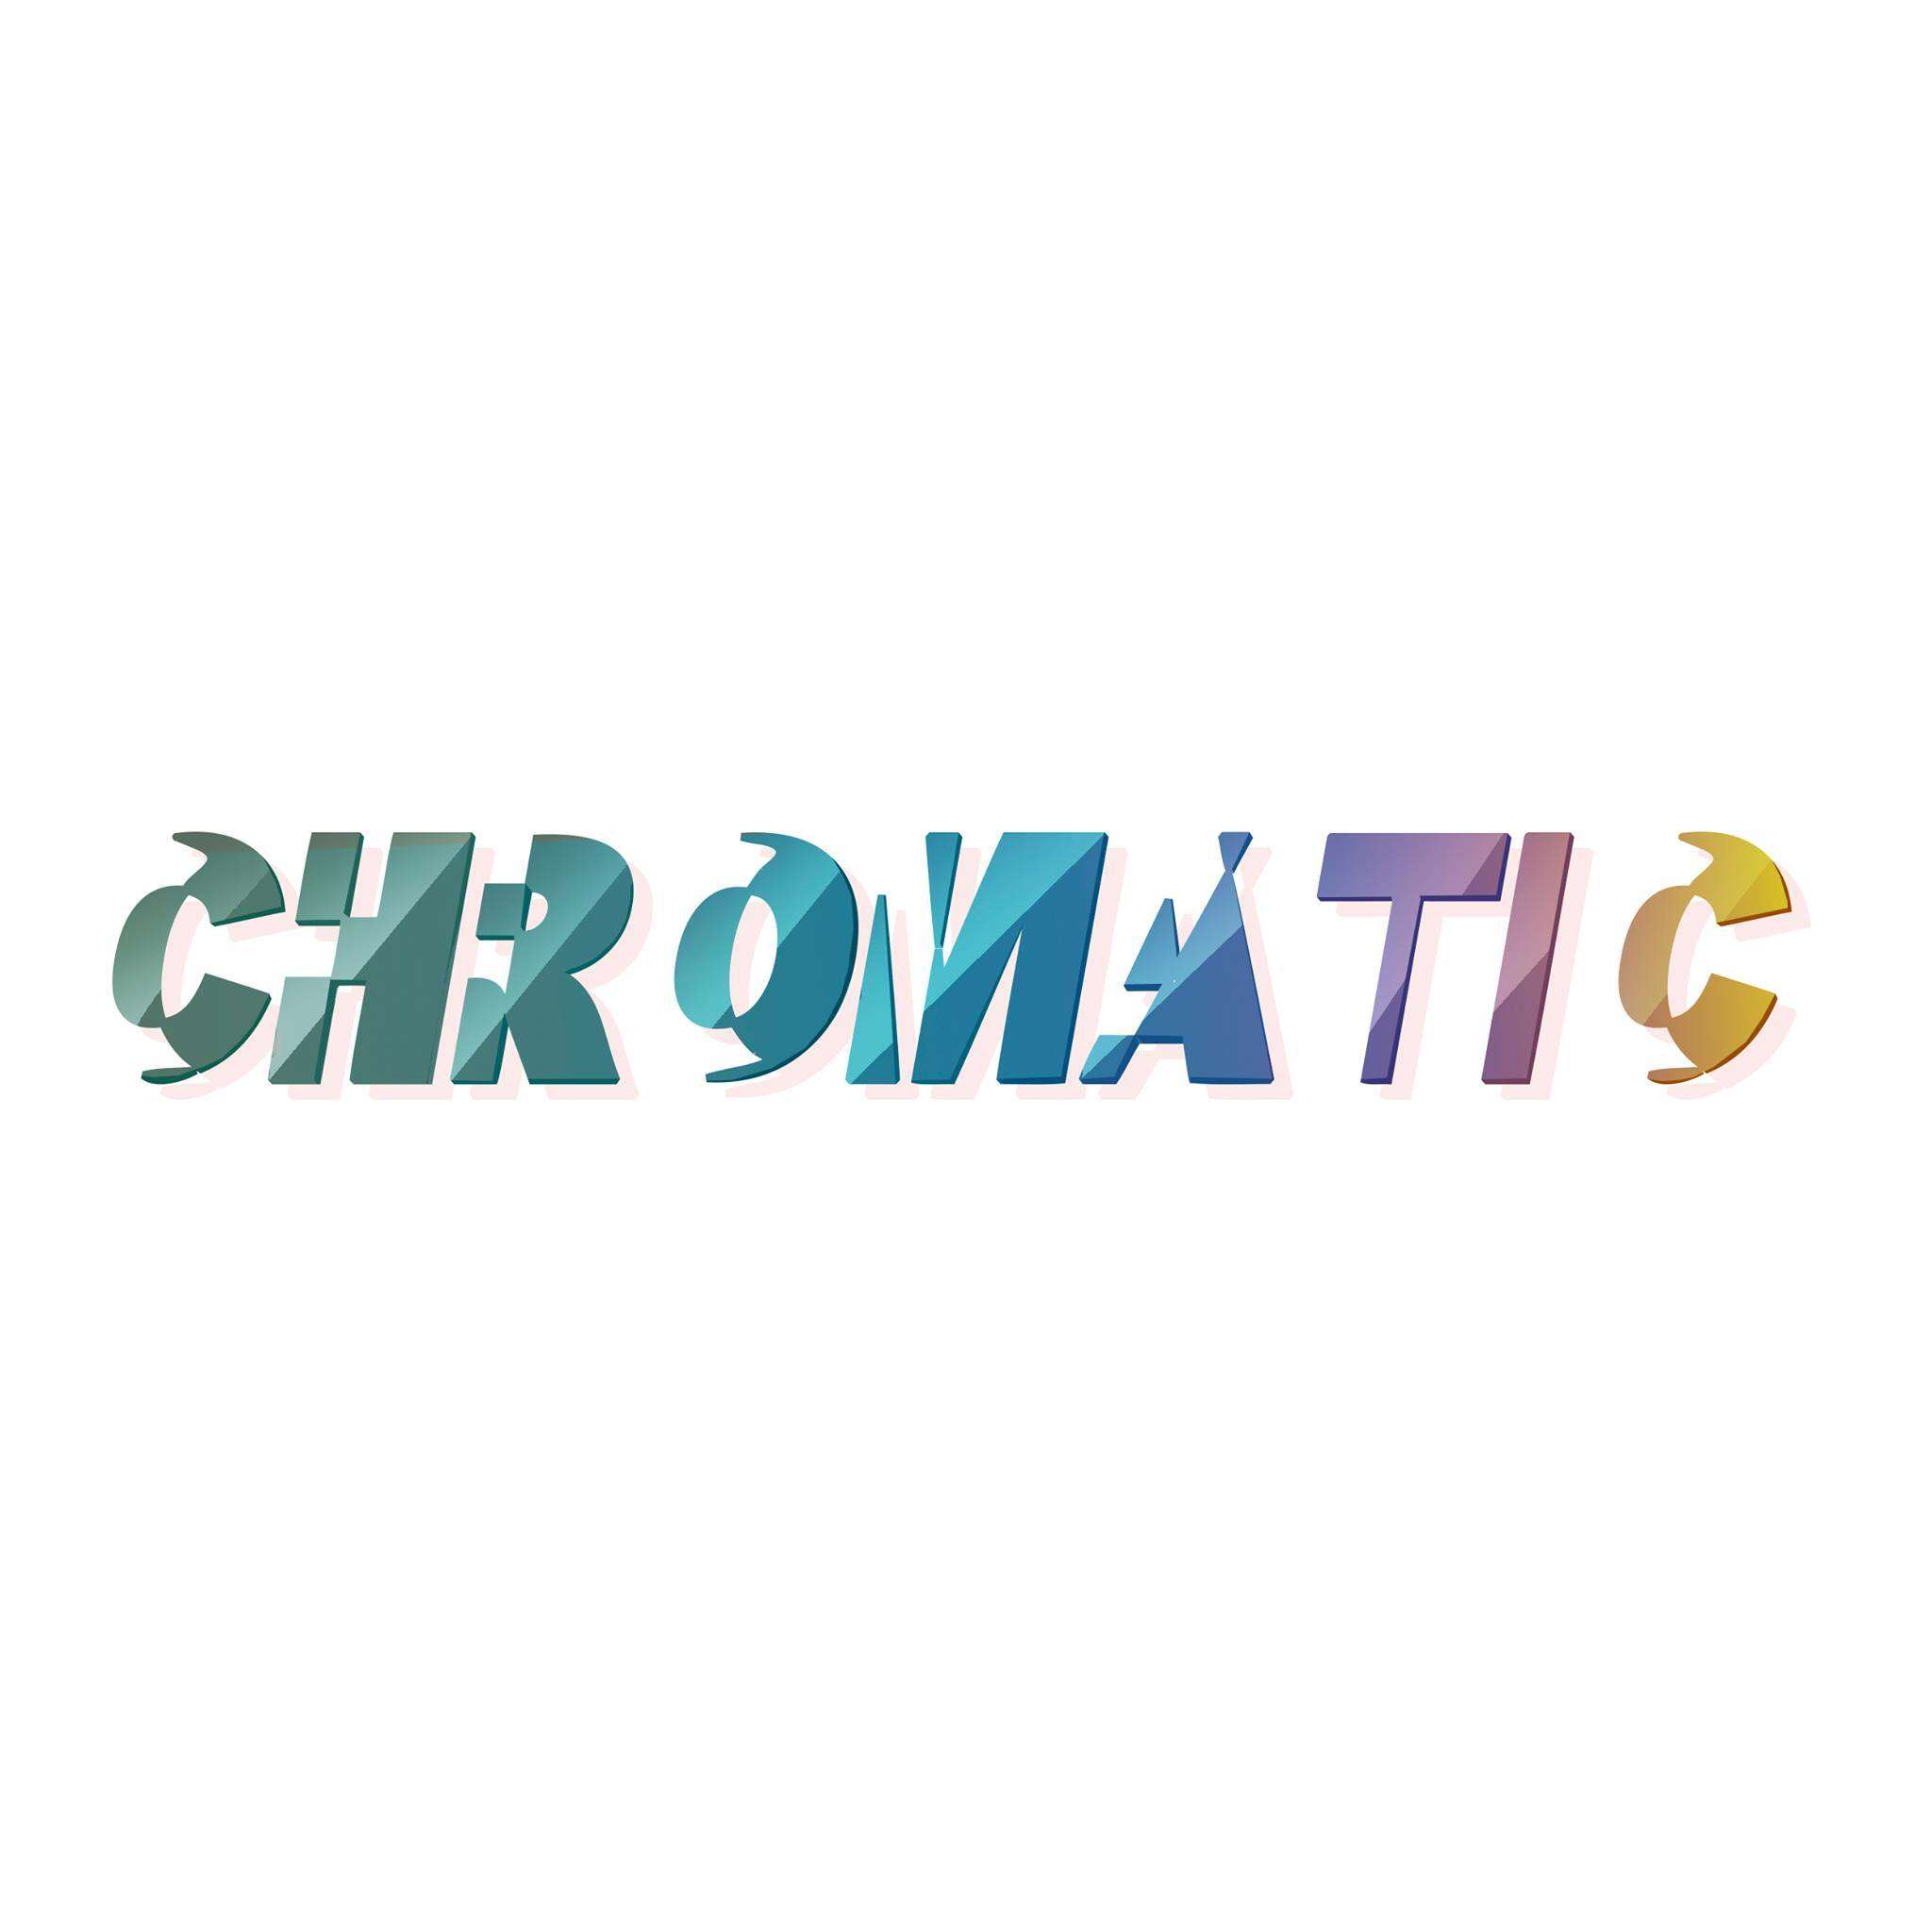 Nueva Sesión en Valencia - Chromatic Winners